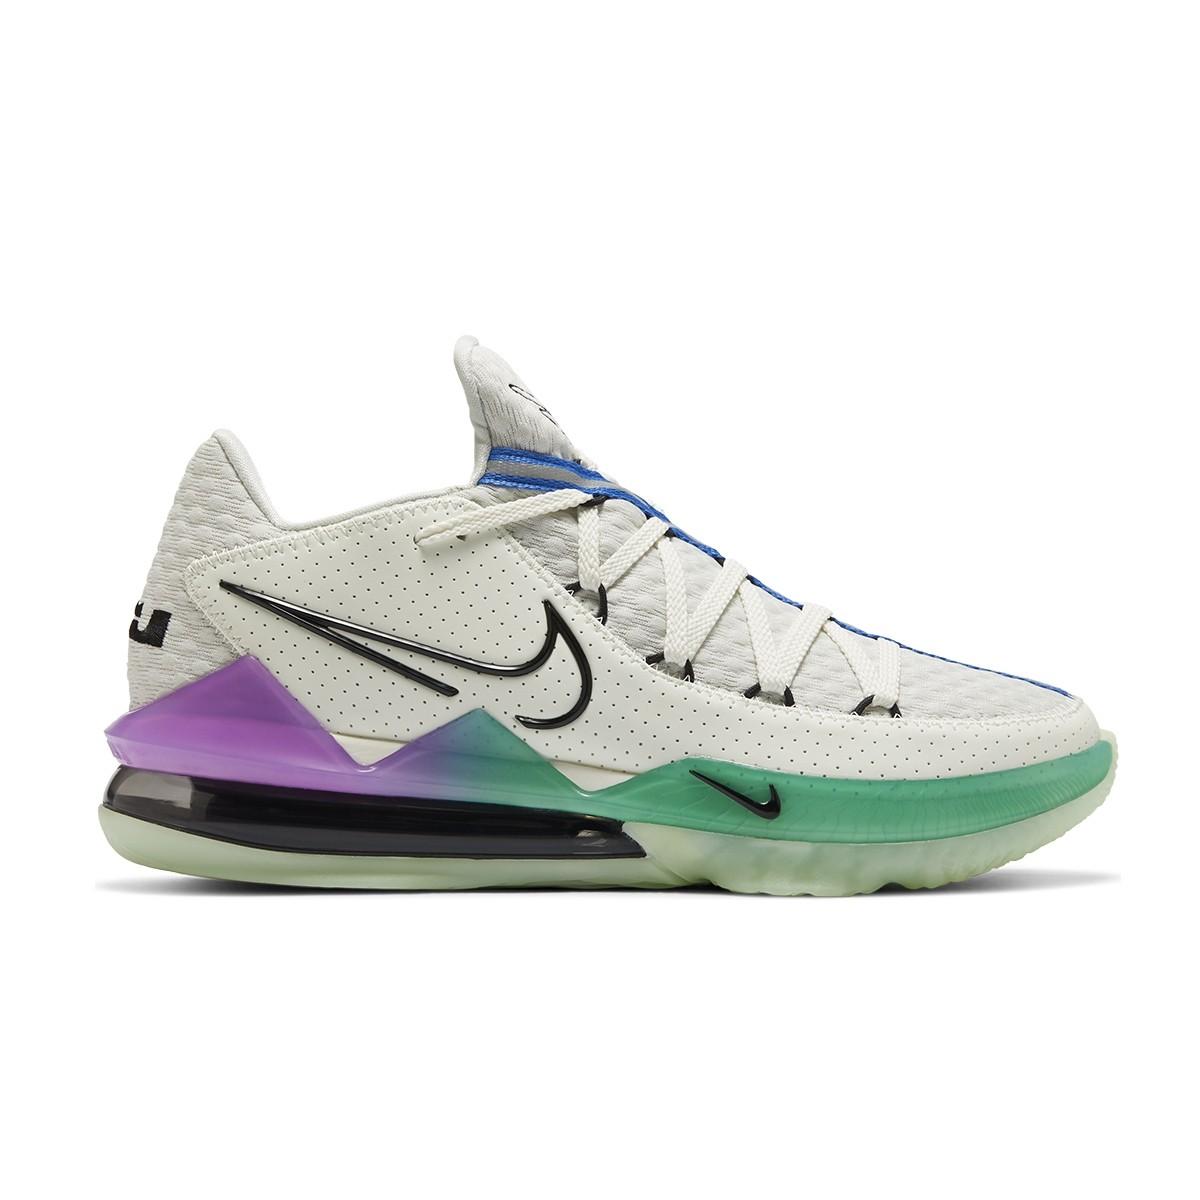 Nike Lebron XVII Low 'Glow In The Dark'